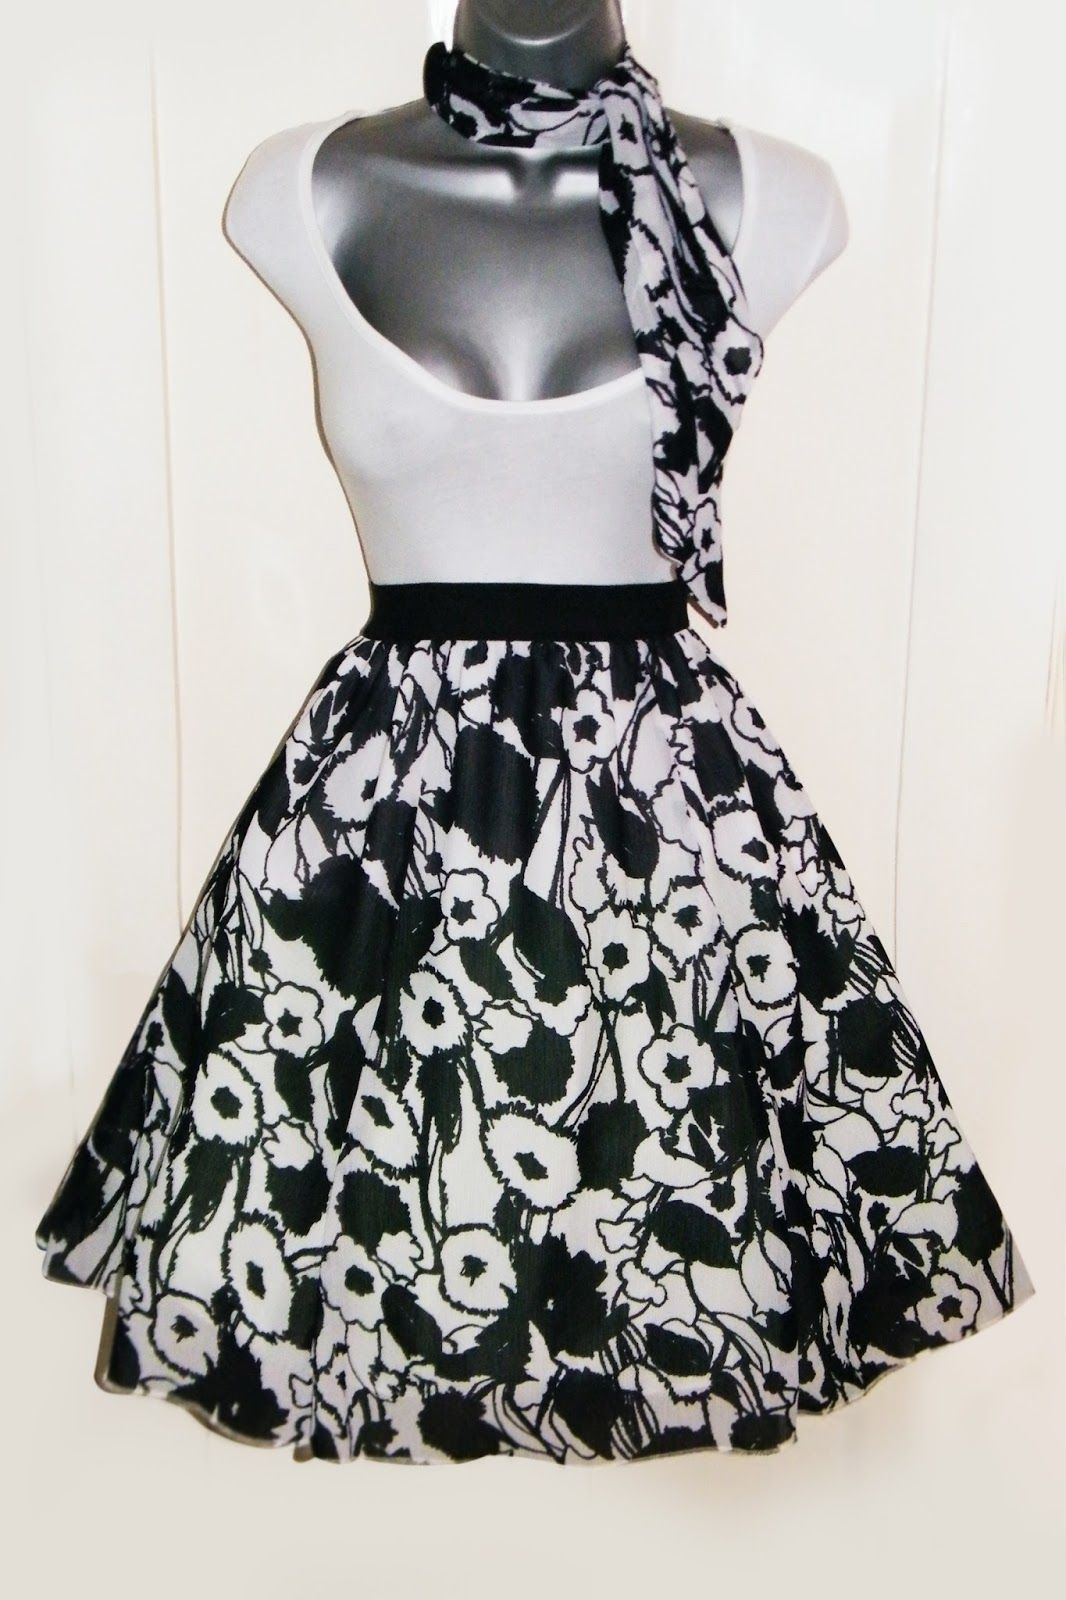 Skirt Upcycle Tutorial Maxi Skirt Into Retro 50s Style